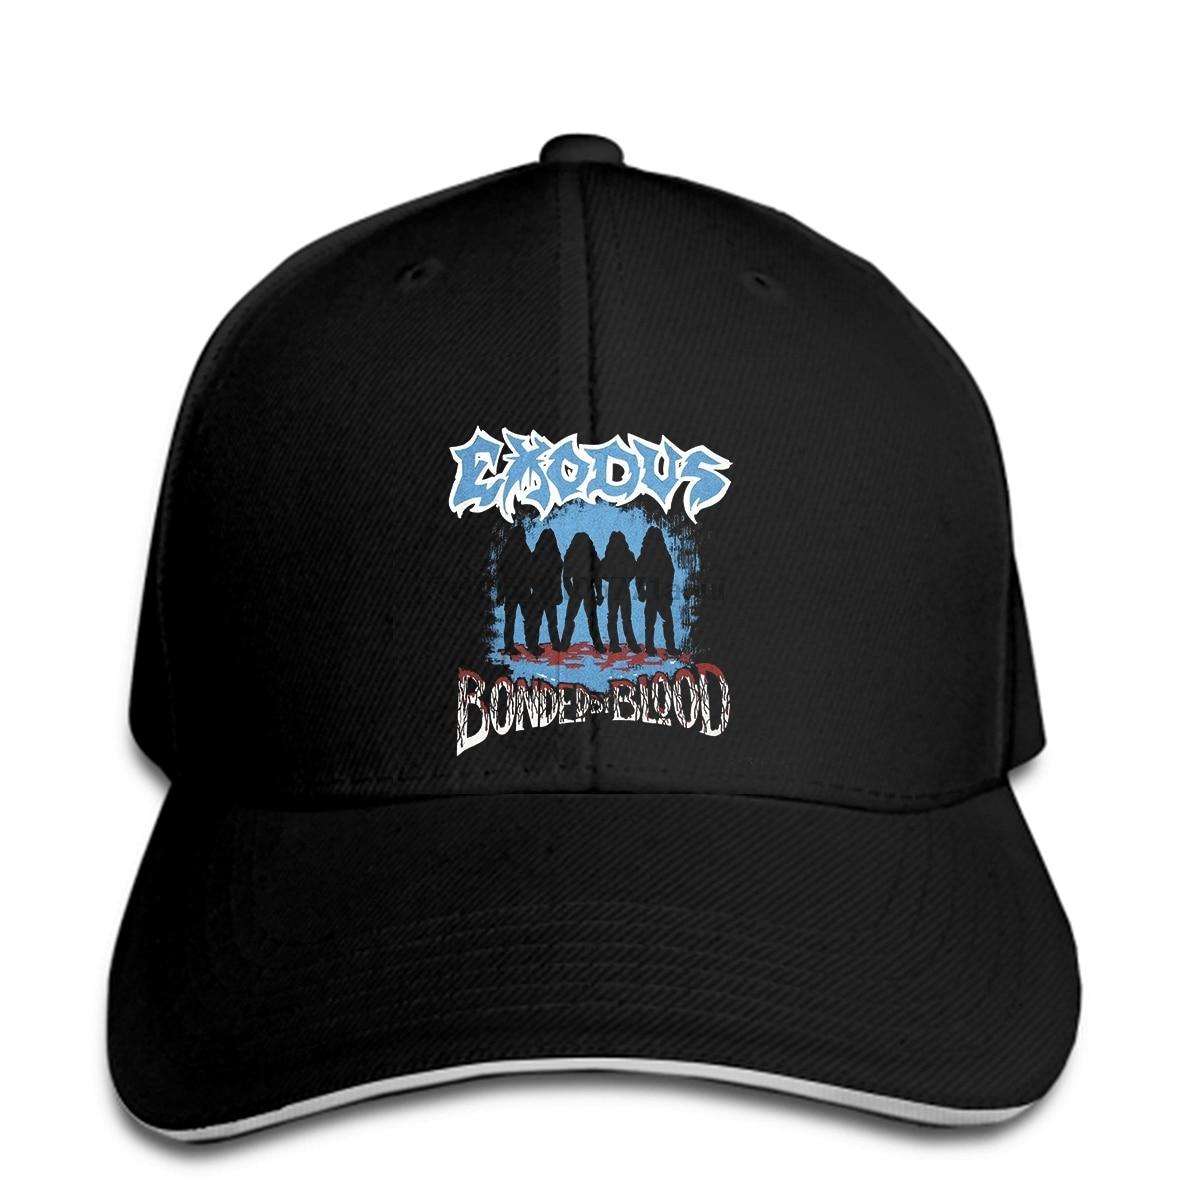 Baseball cap Vintage Print hat 80's EXODUS Tour Concert 1986 Slay Team BAY AREA THRASH Reprint